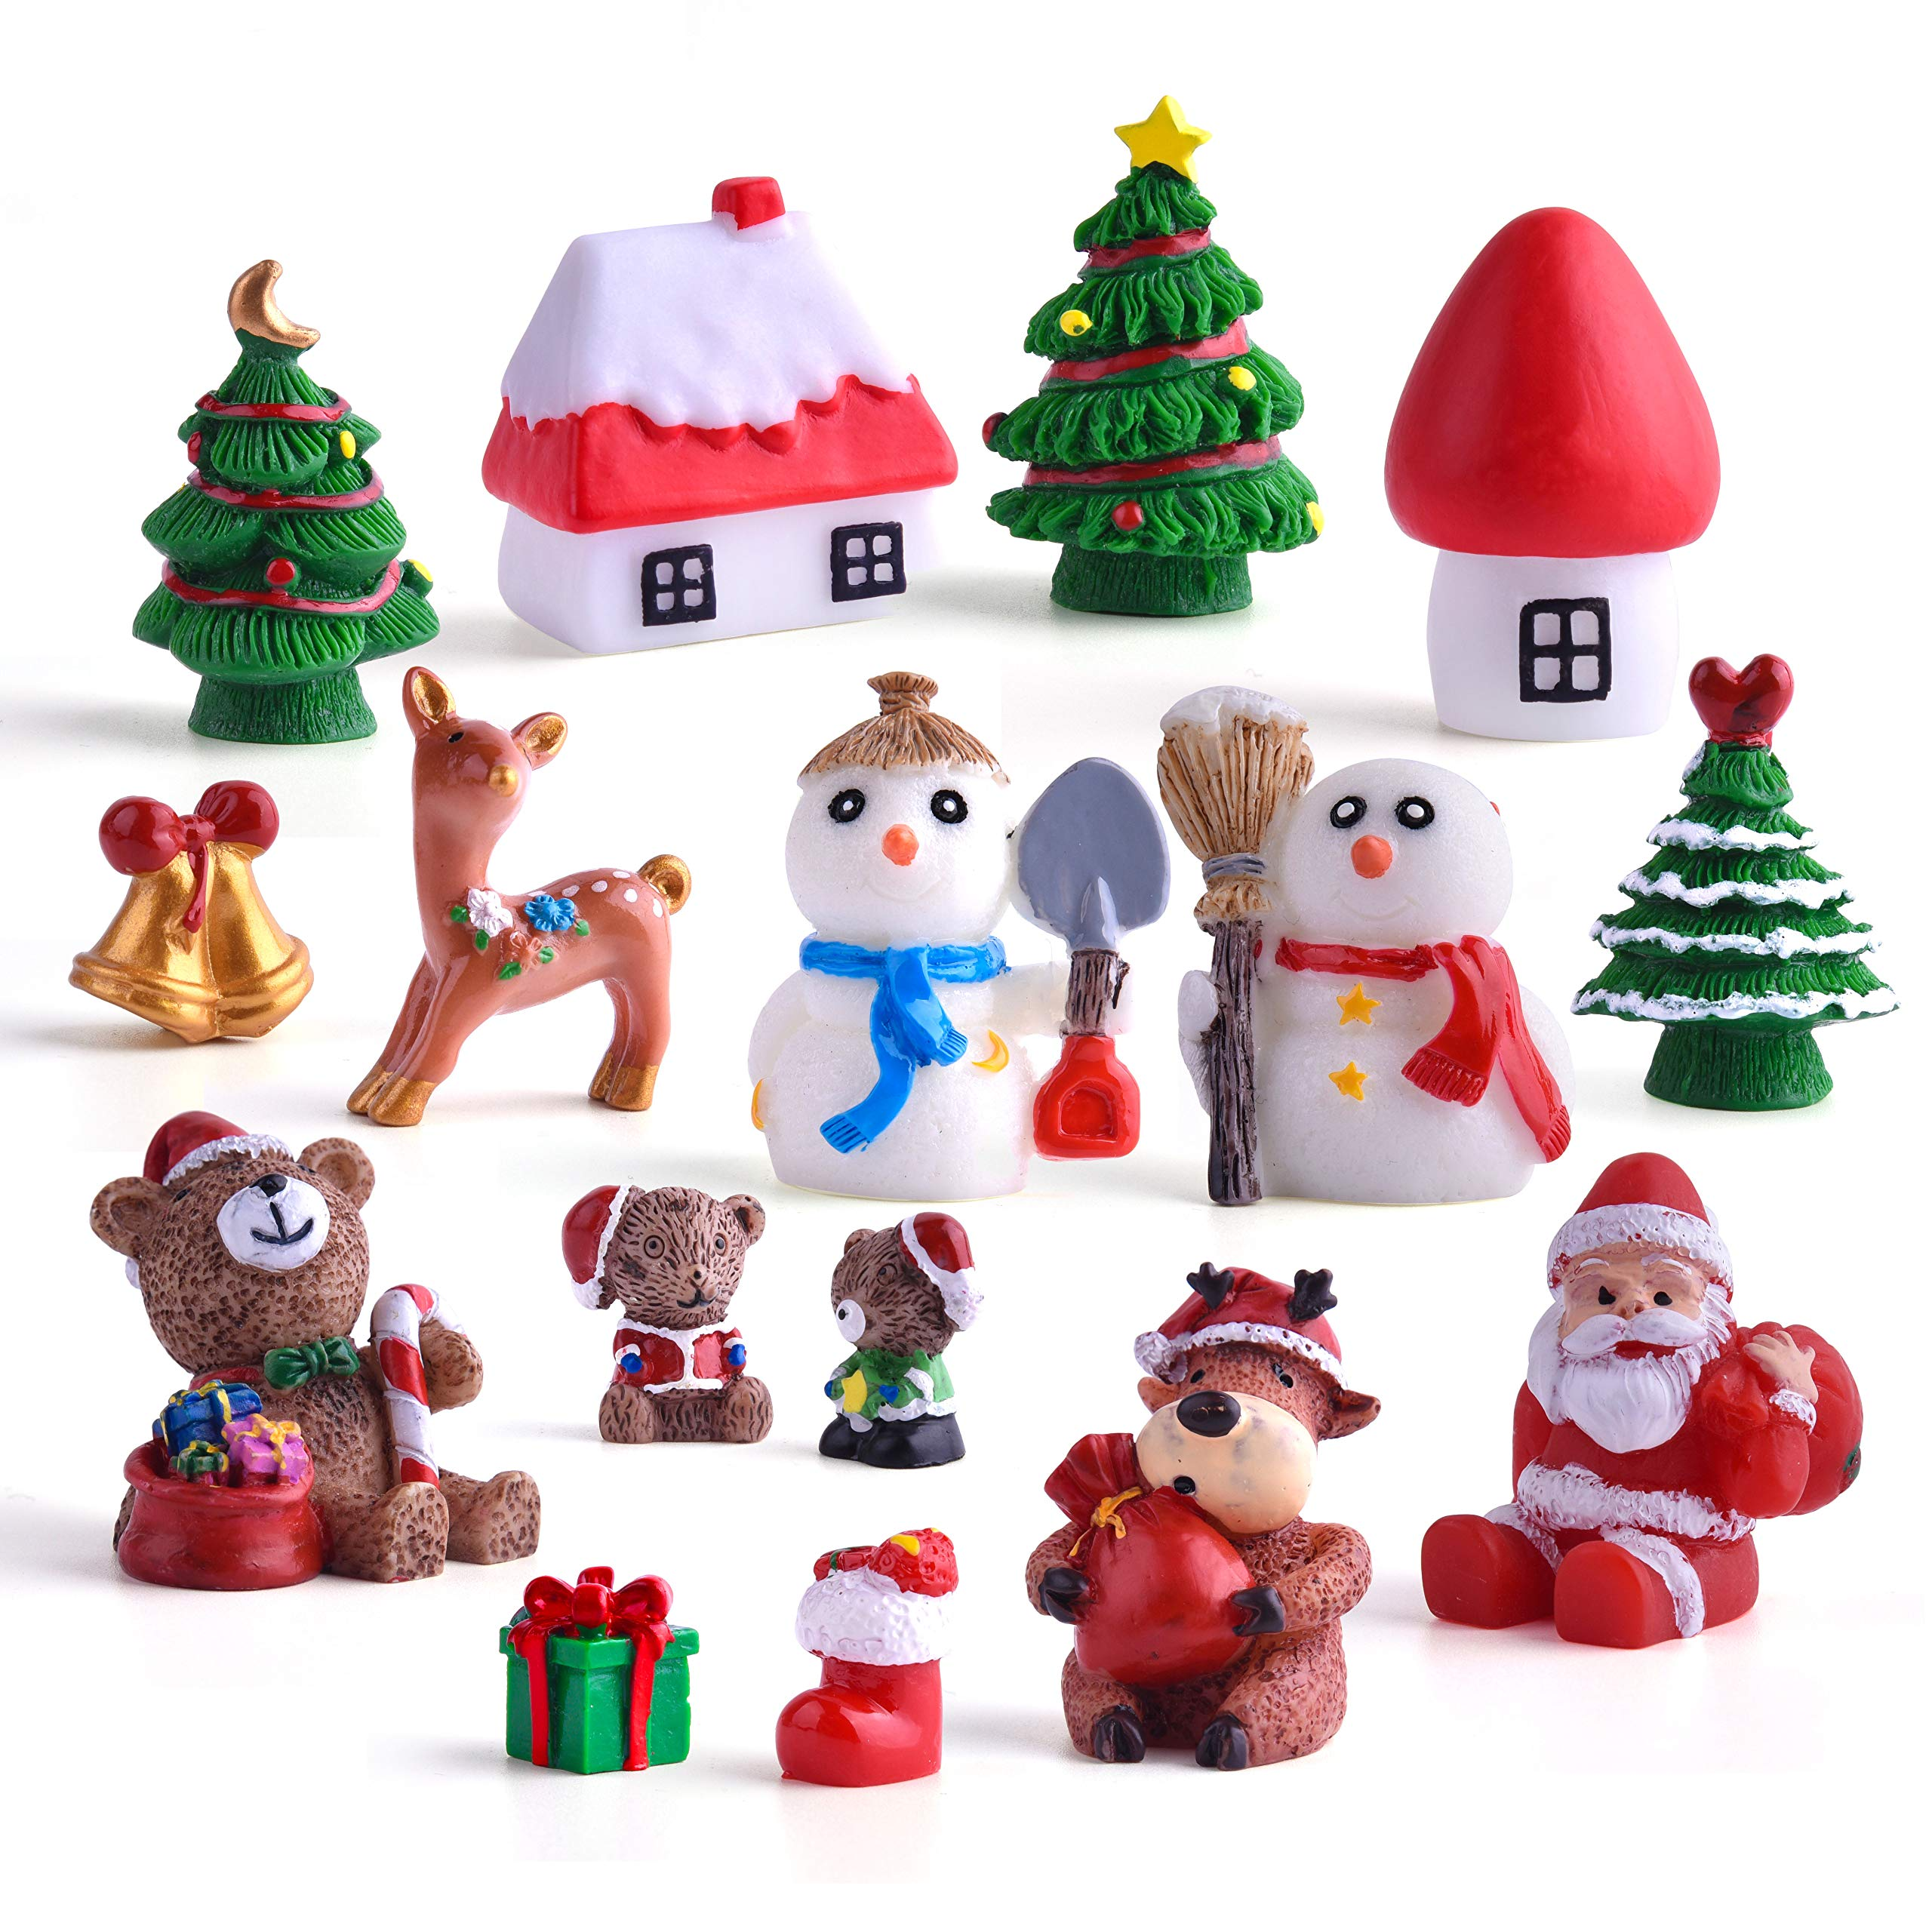 Benvo 32 Pcs Christmas Miniature Ornaments for DIY Fairy Garden Dollhouse Snow Globes Xmas Decoration Kit DIY Accessory Includes Santa,Christmas Trees,Snowman,Snowflake,Red Socks,Reindeer etc